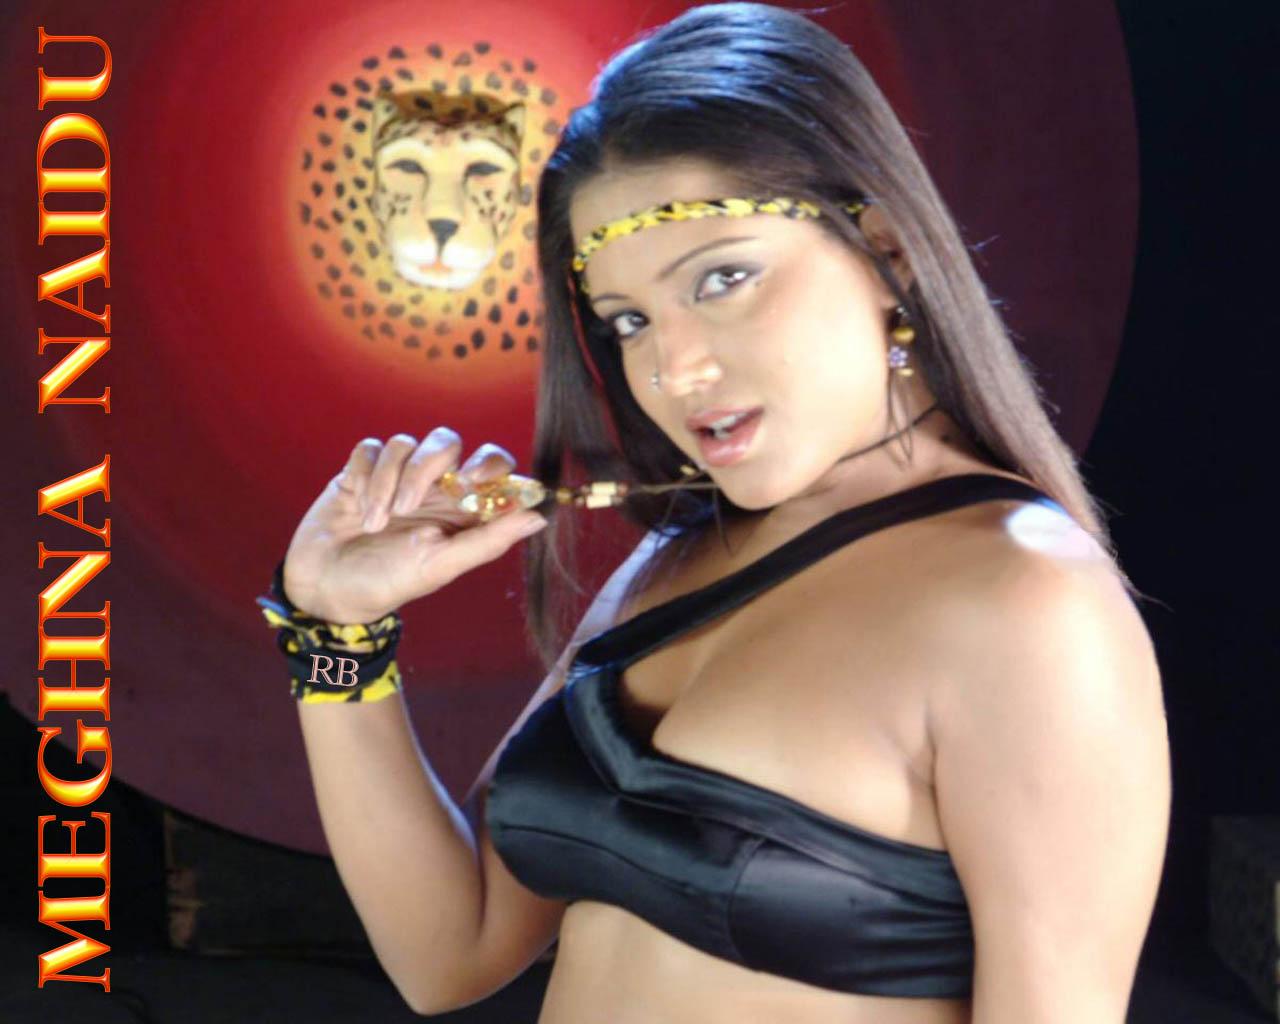 Meghiana naidu nude sex faked — photo 14